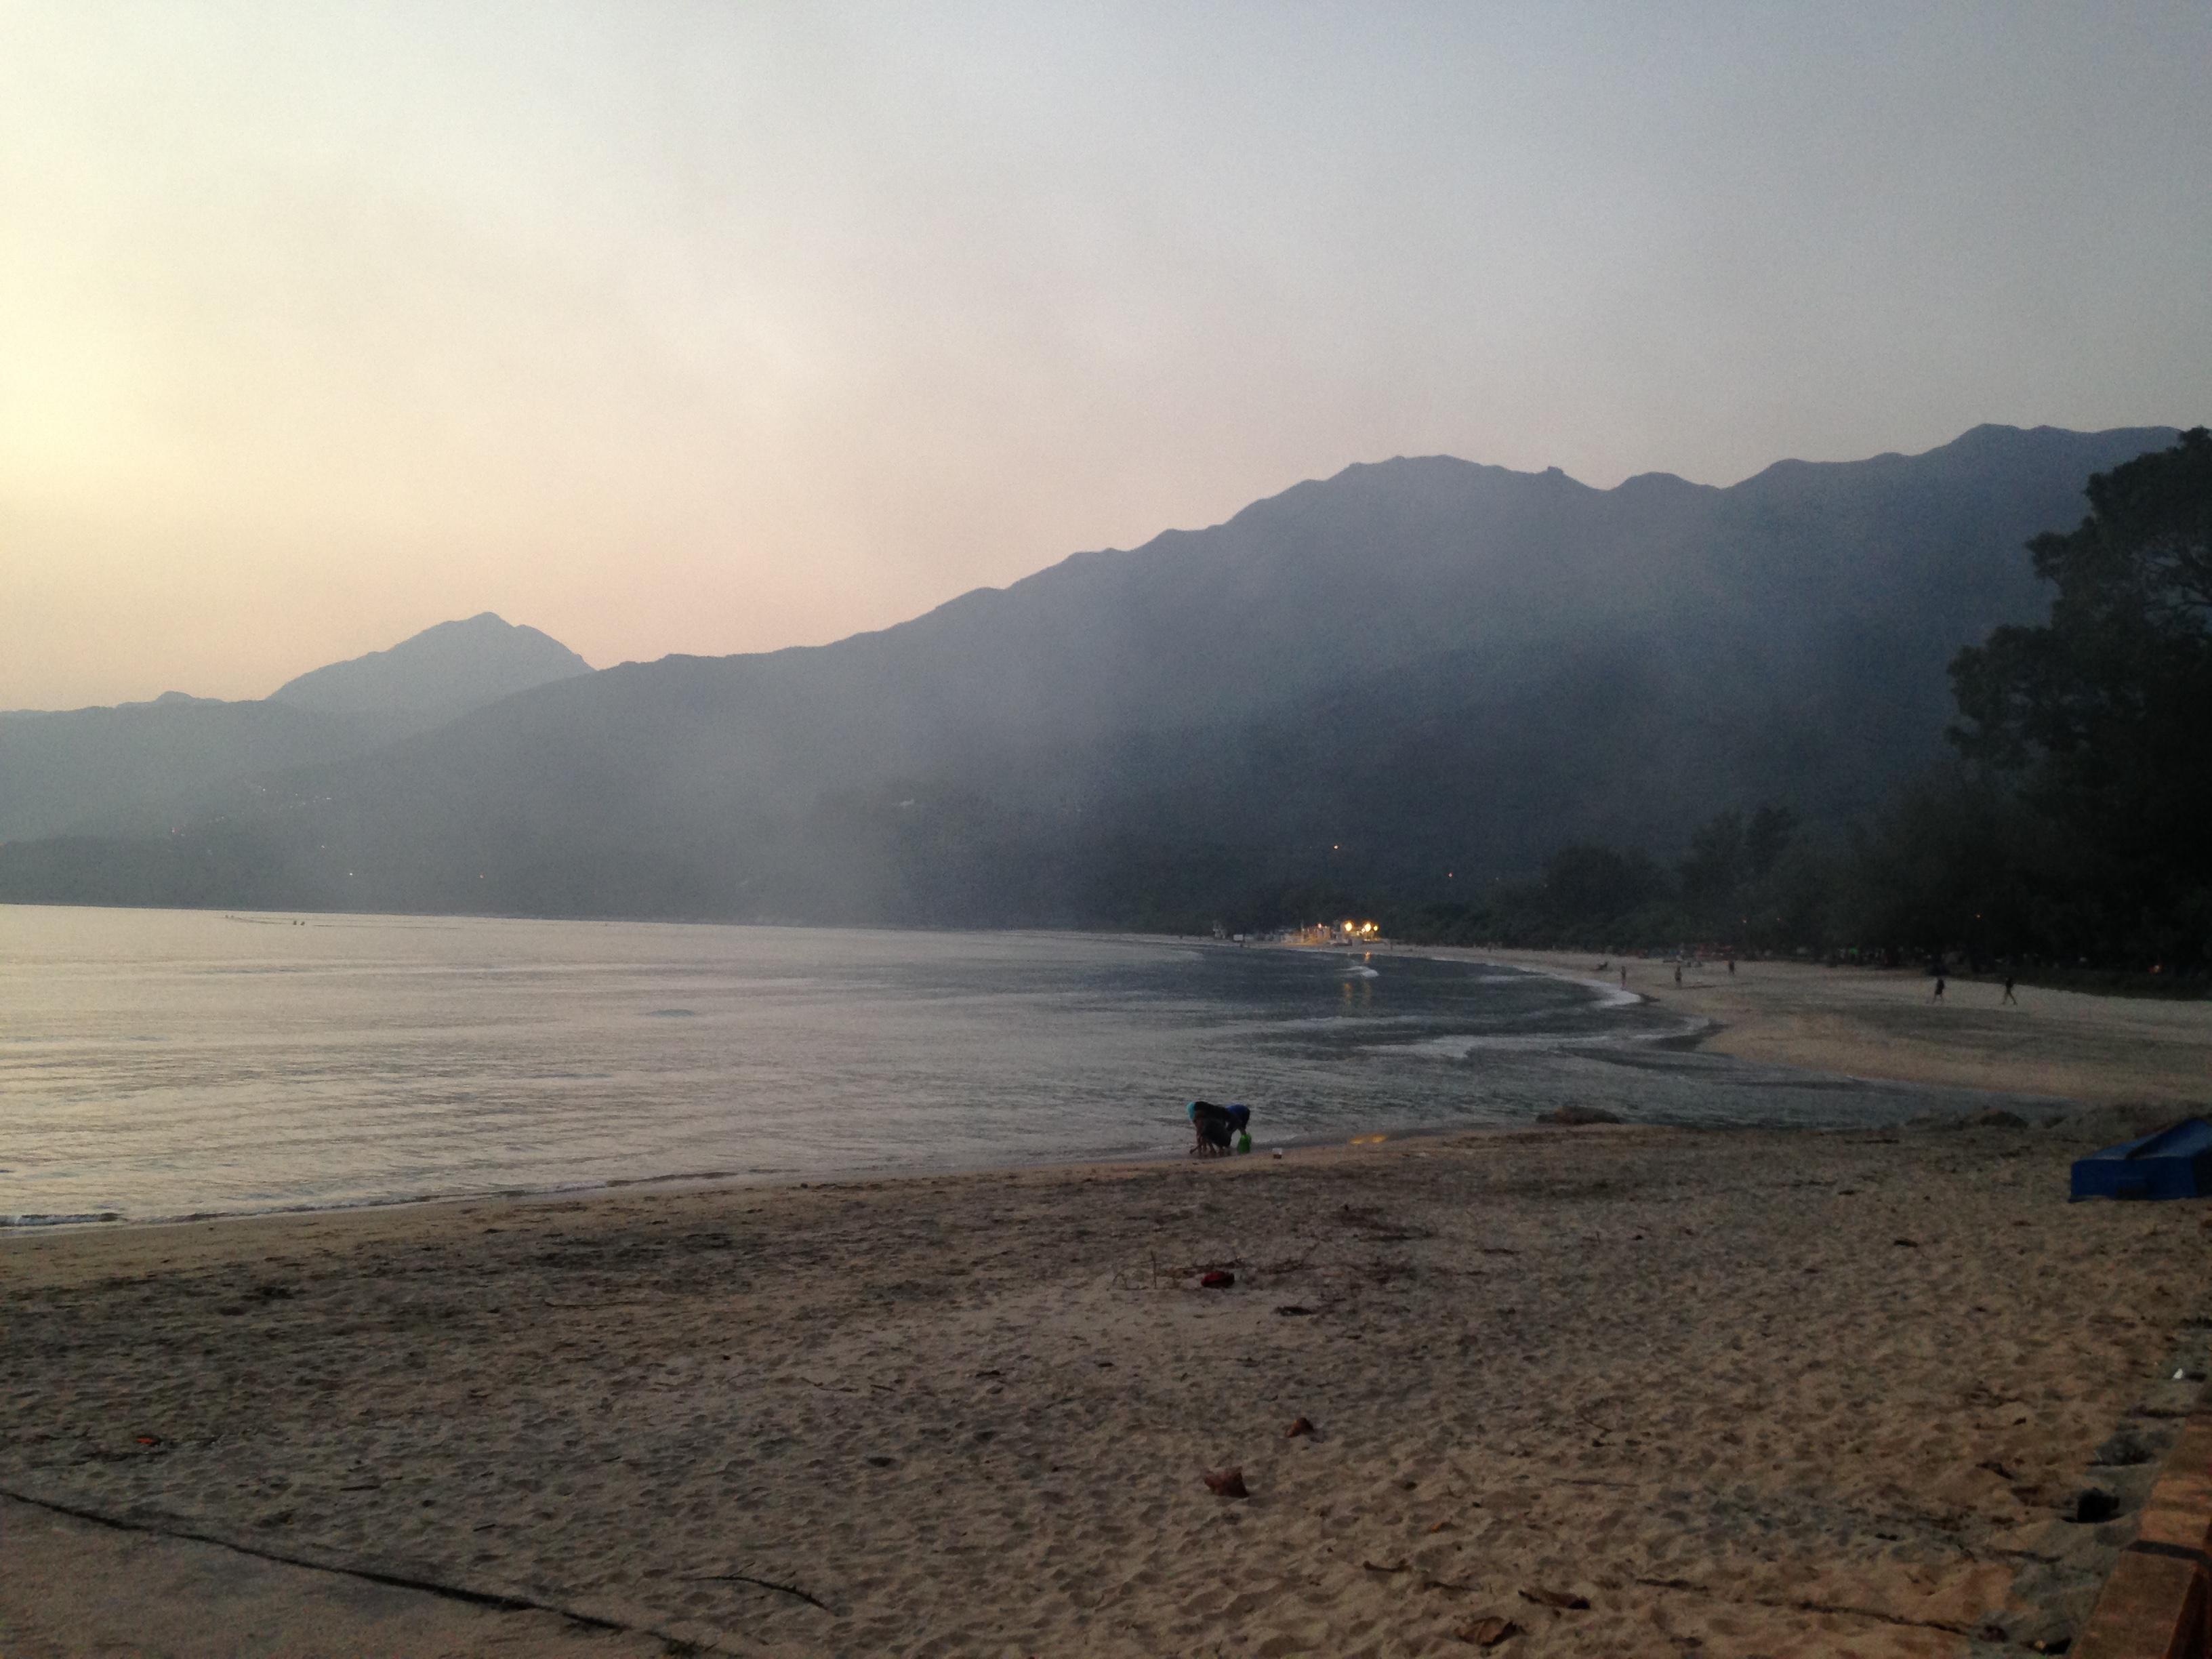 how to get to pui o beach